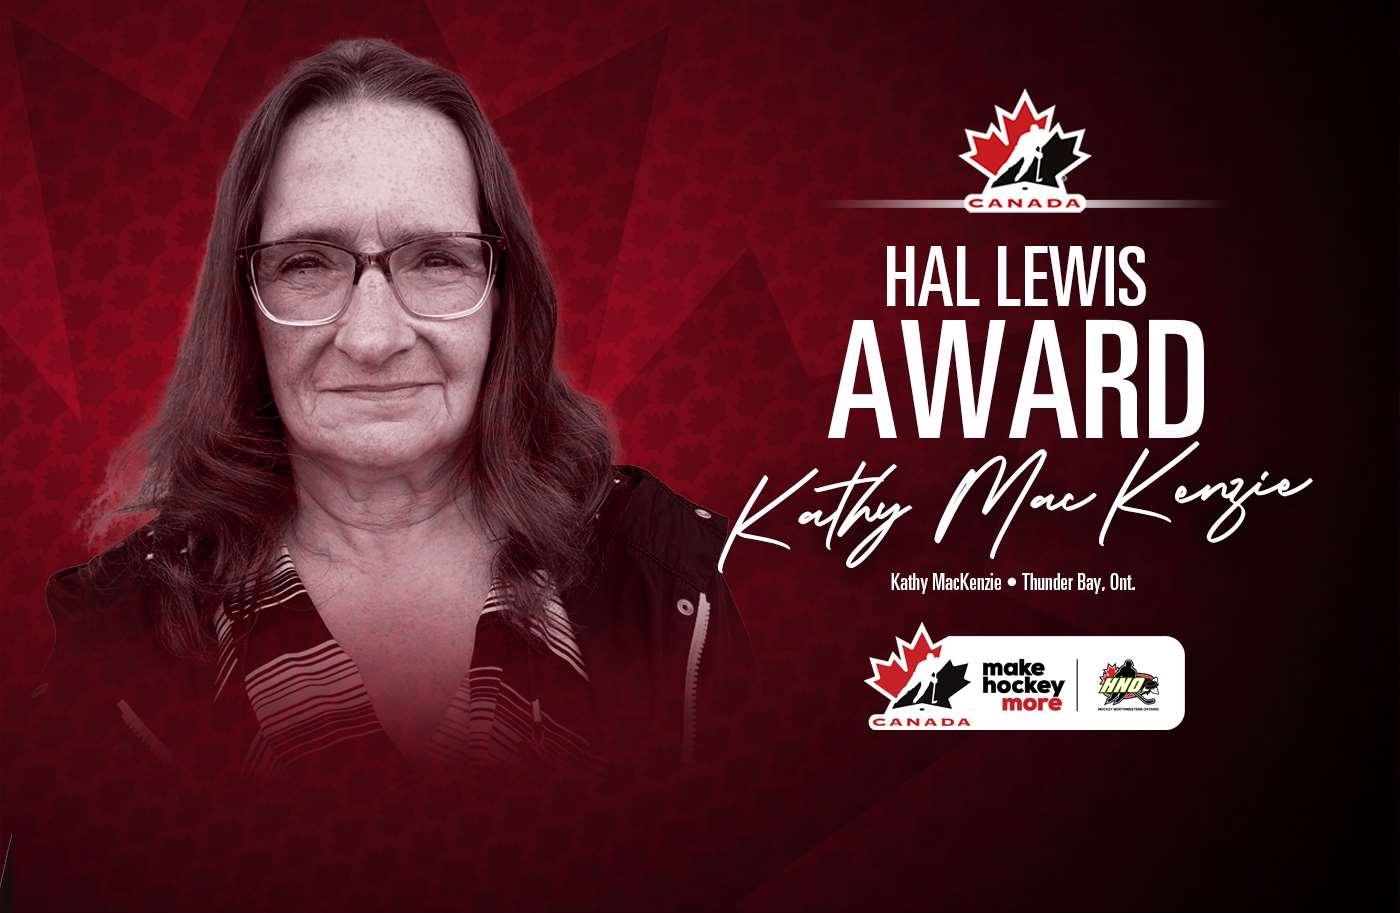 2021 hal lewis award member kathy mackenzie 1400 e